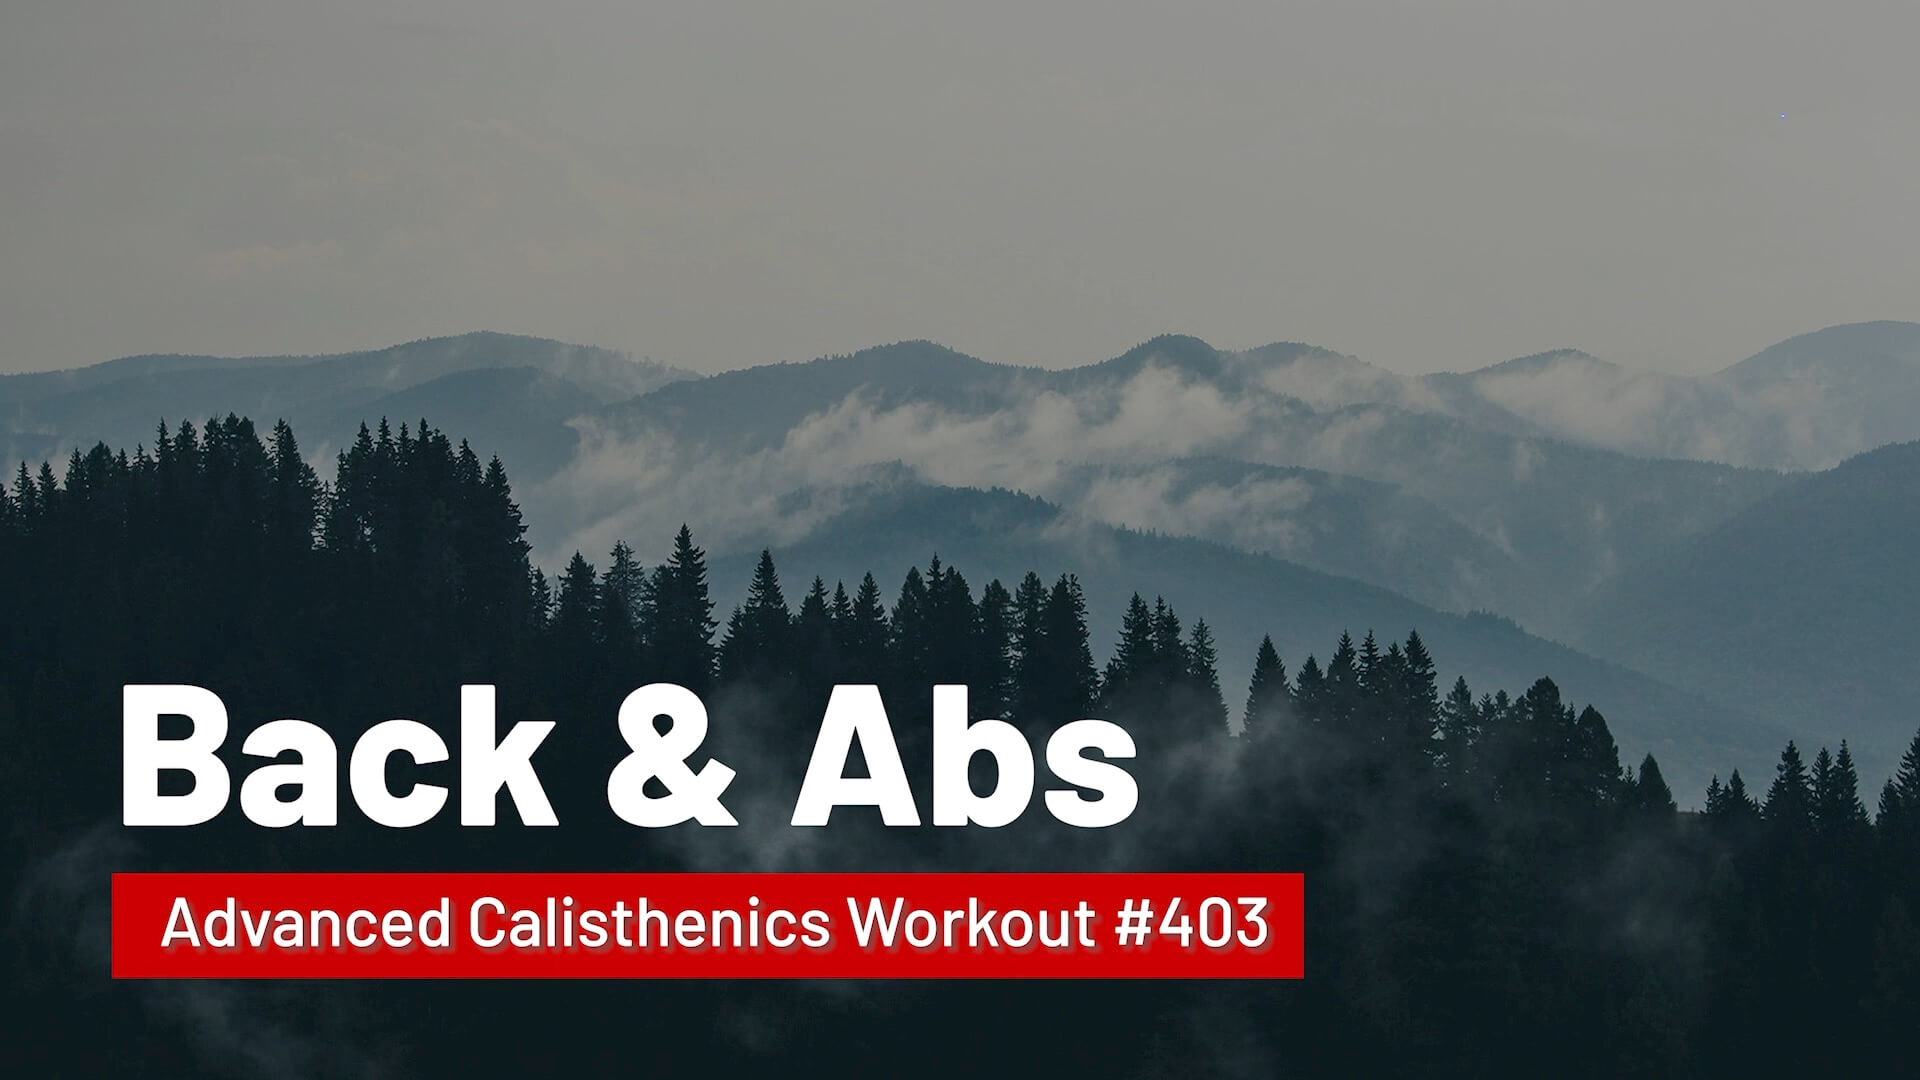 Workout #403